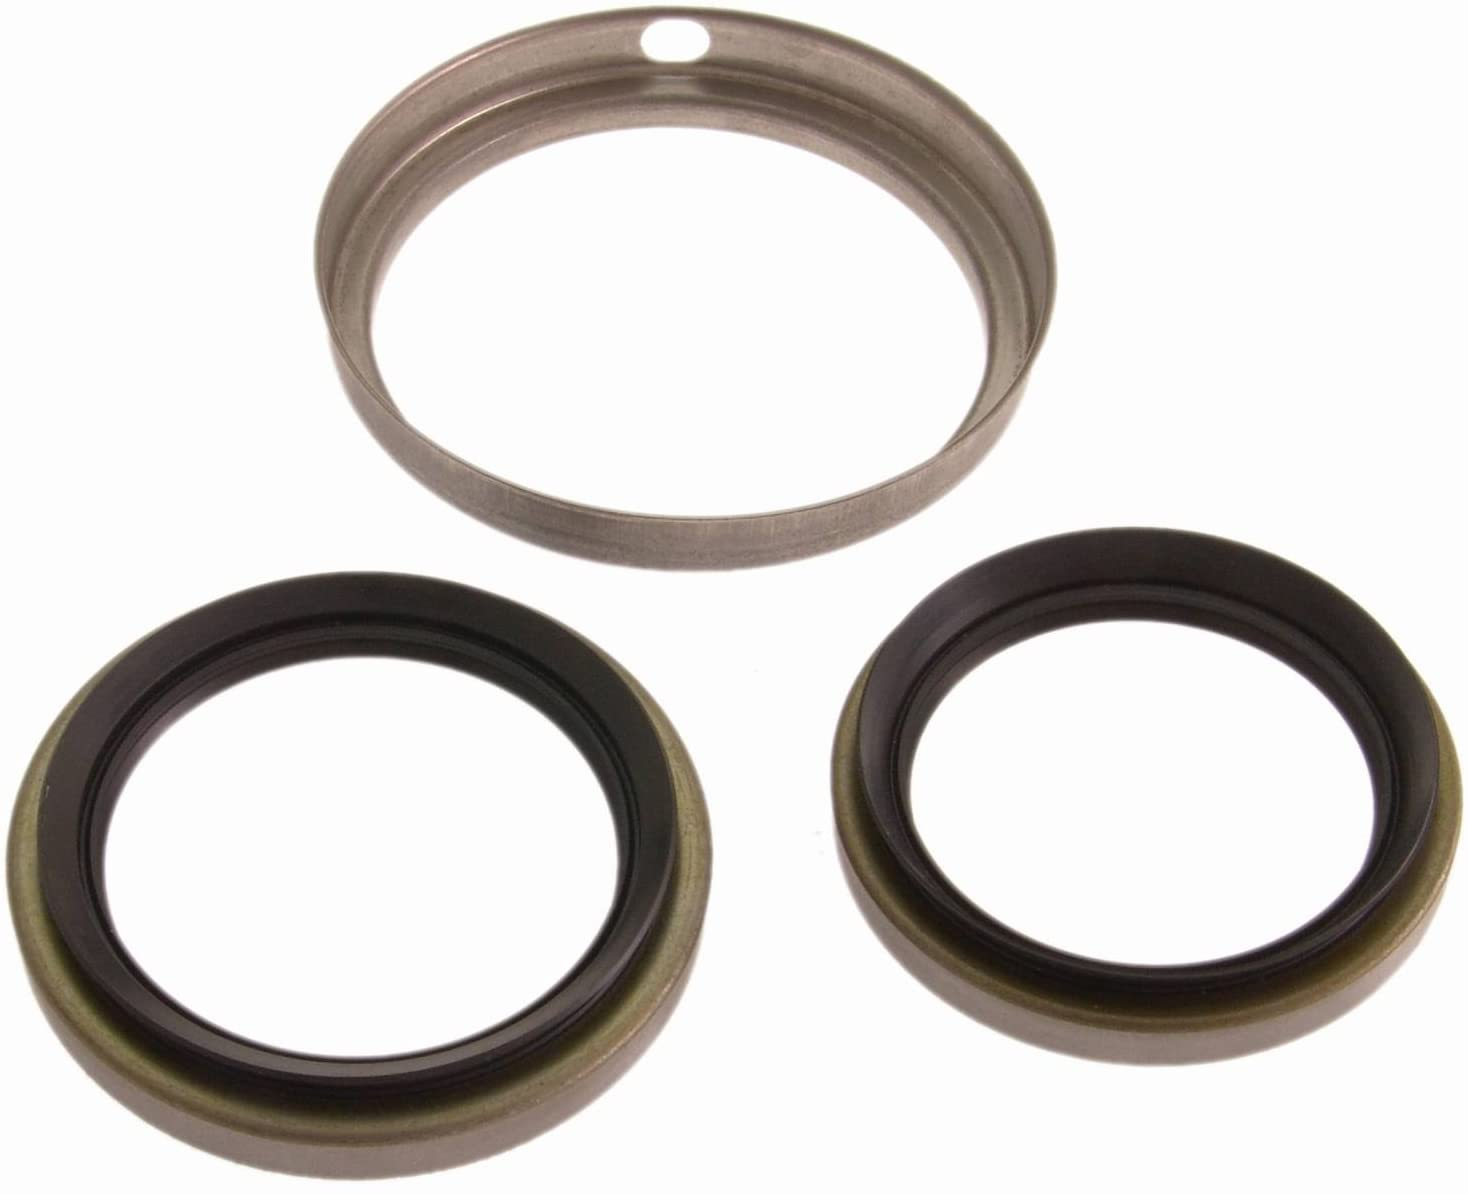 442220080 - Oil Seal Hub Set For Toyota